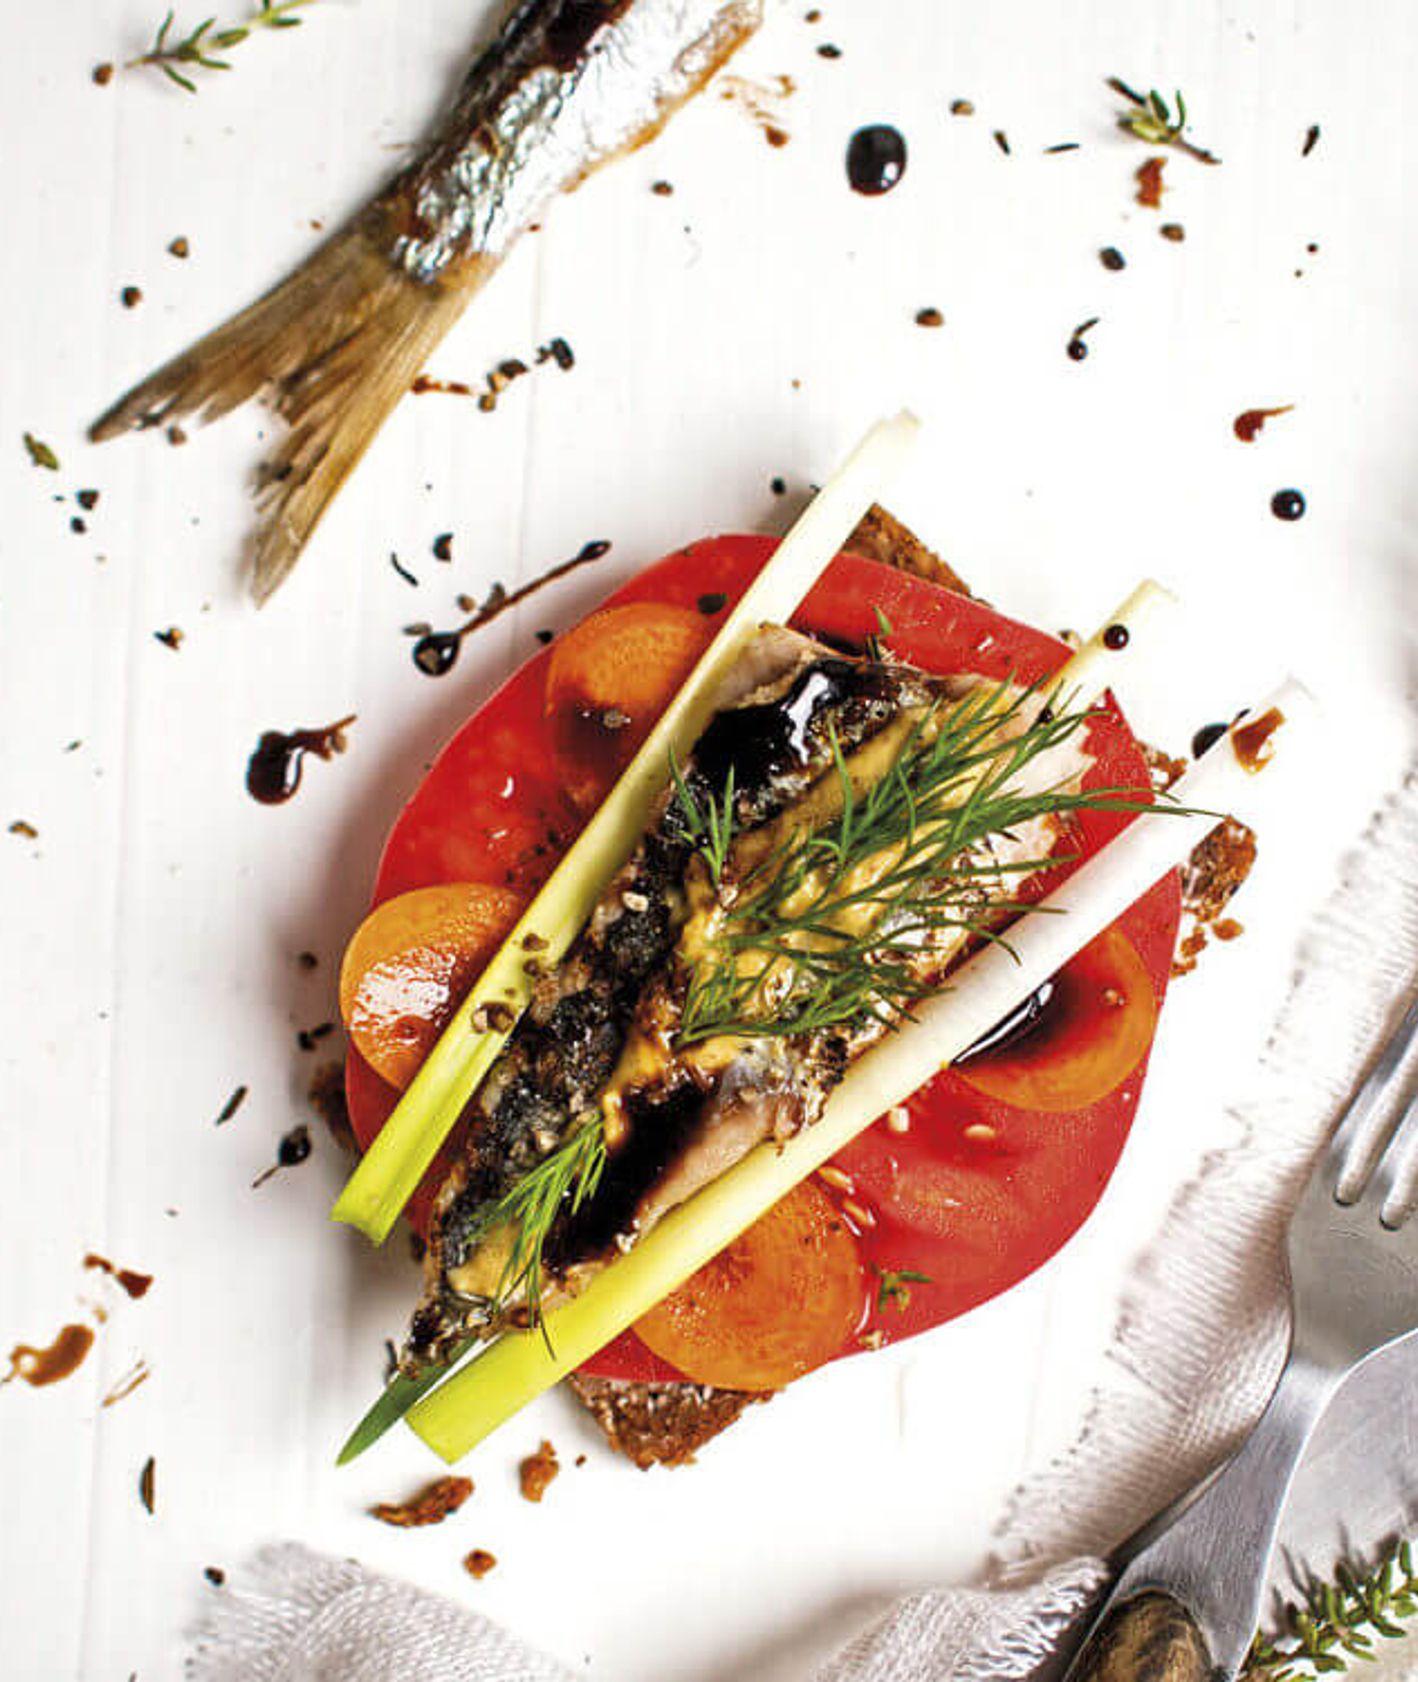 Słodki śledź na kanapce  z pomidorem i musztardą